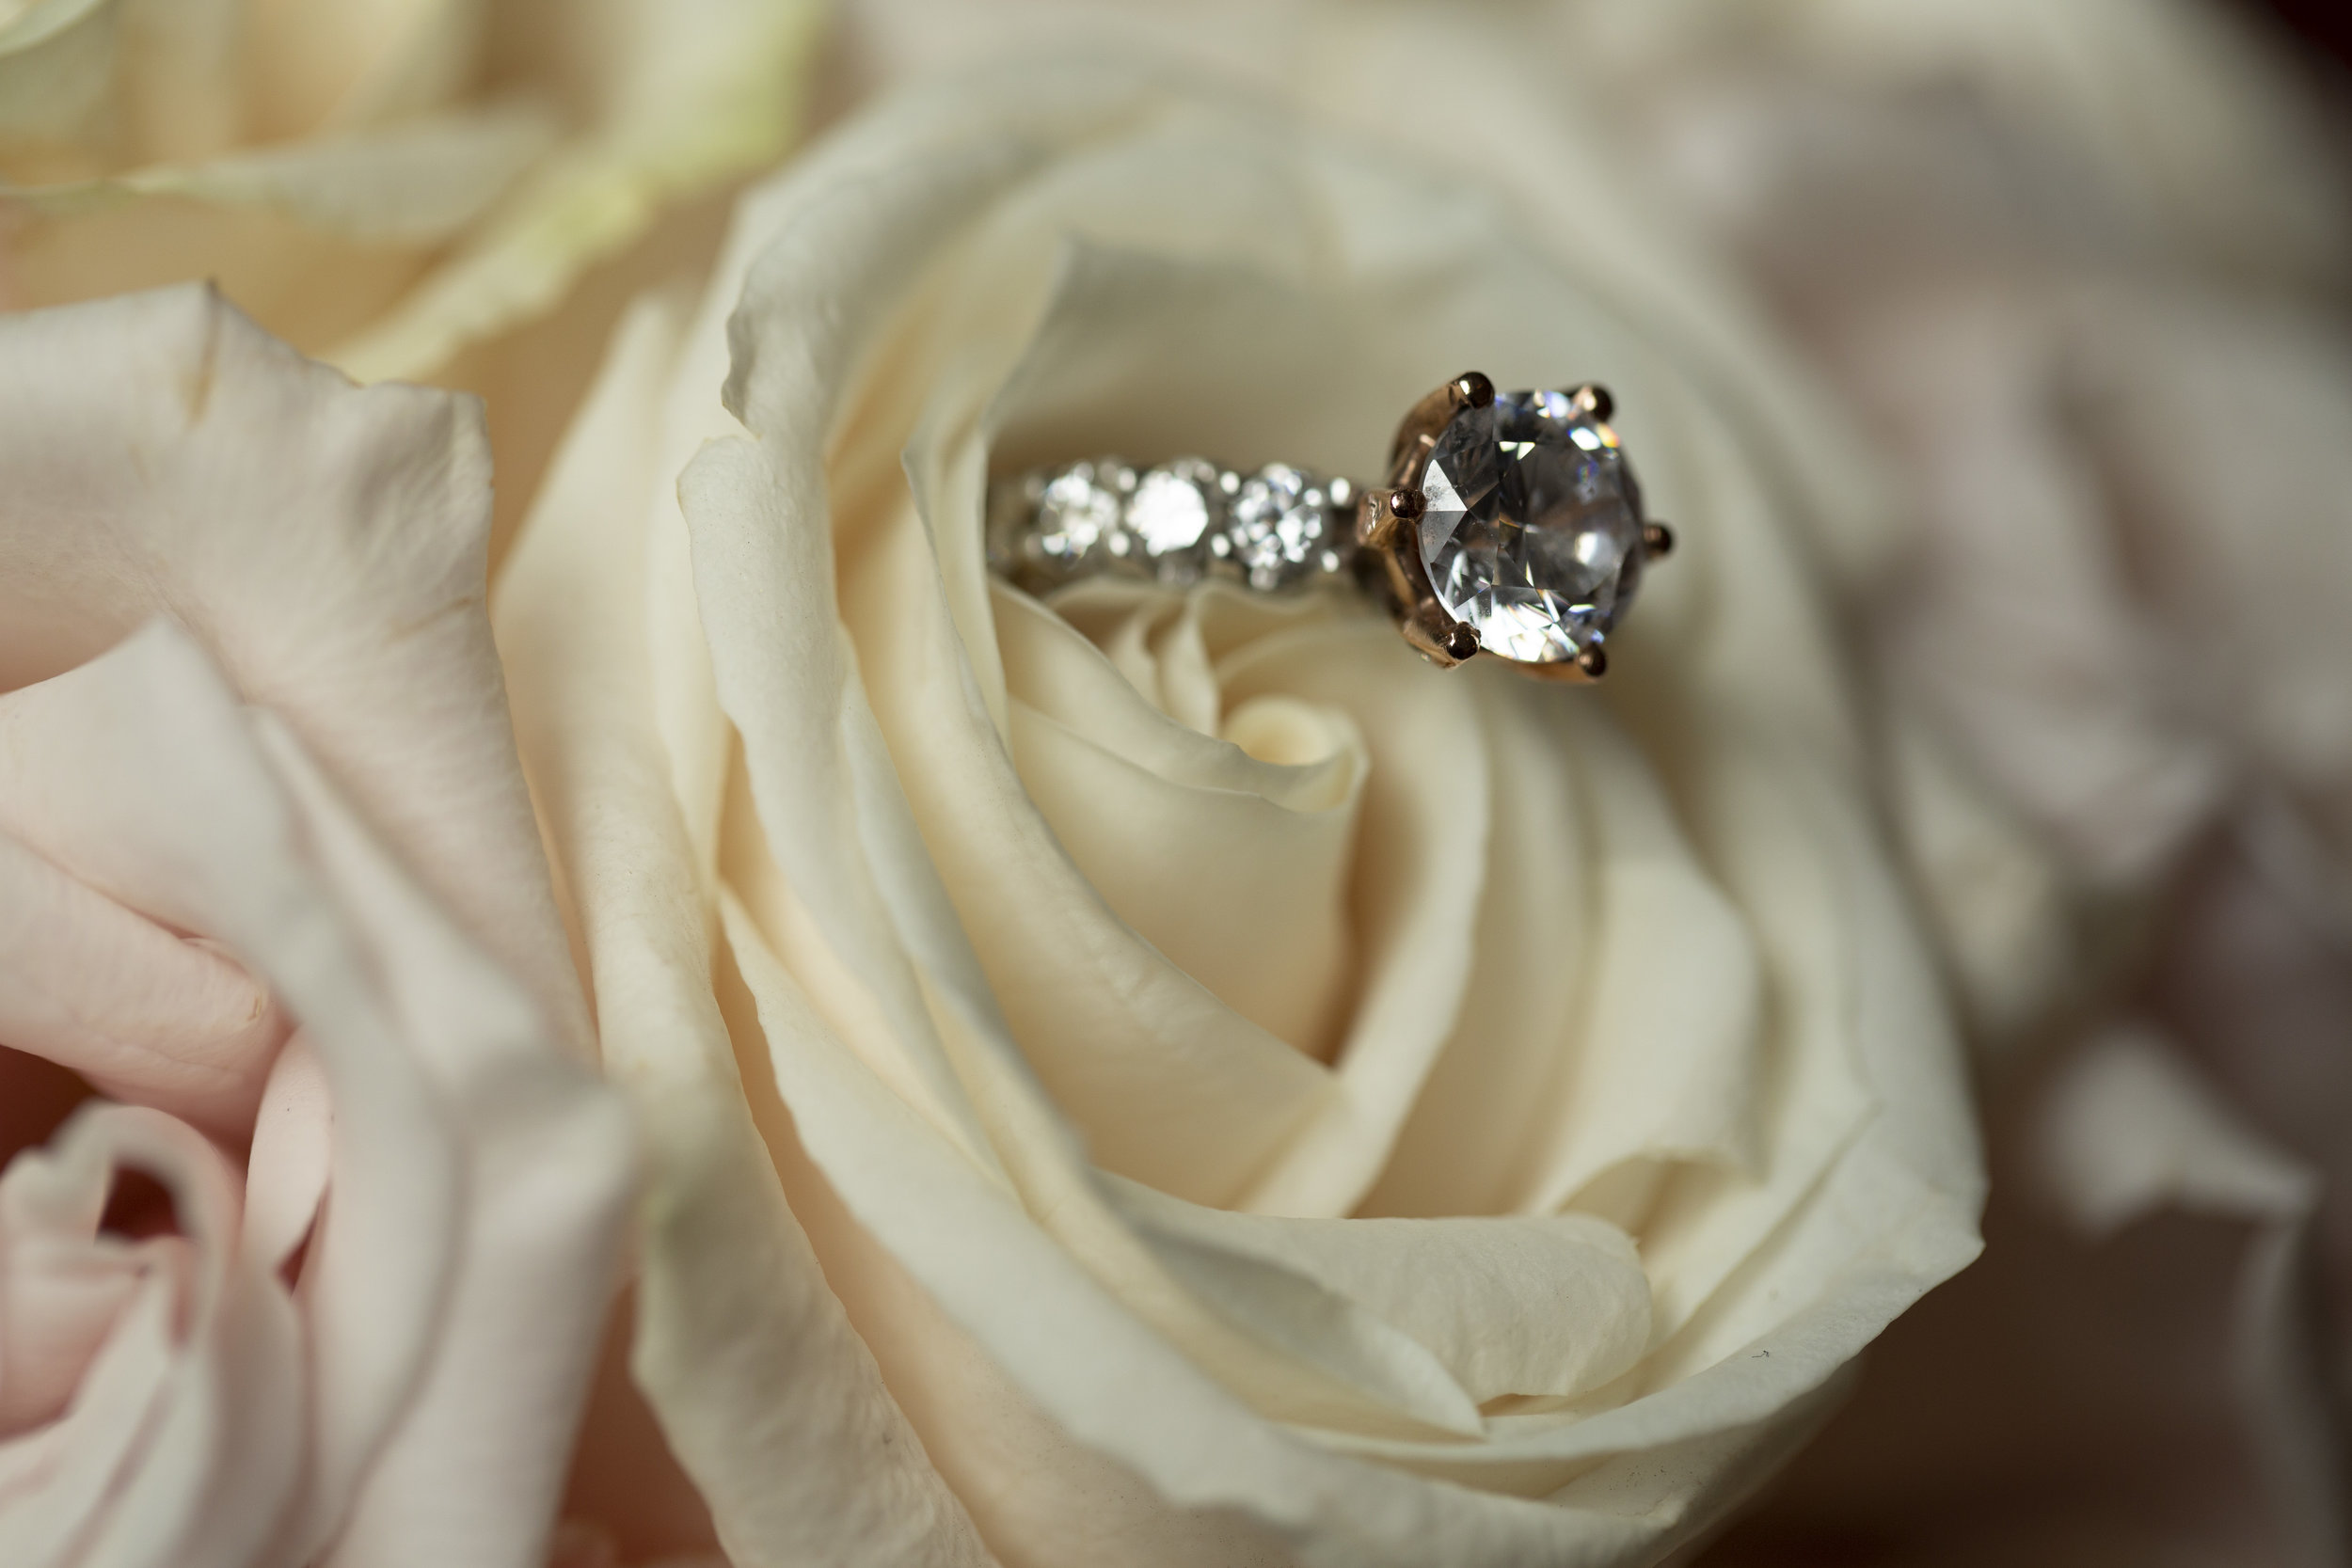 INDIAN WEDDING RING IN FLOWER.JPG